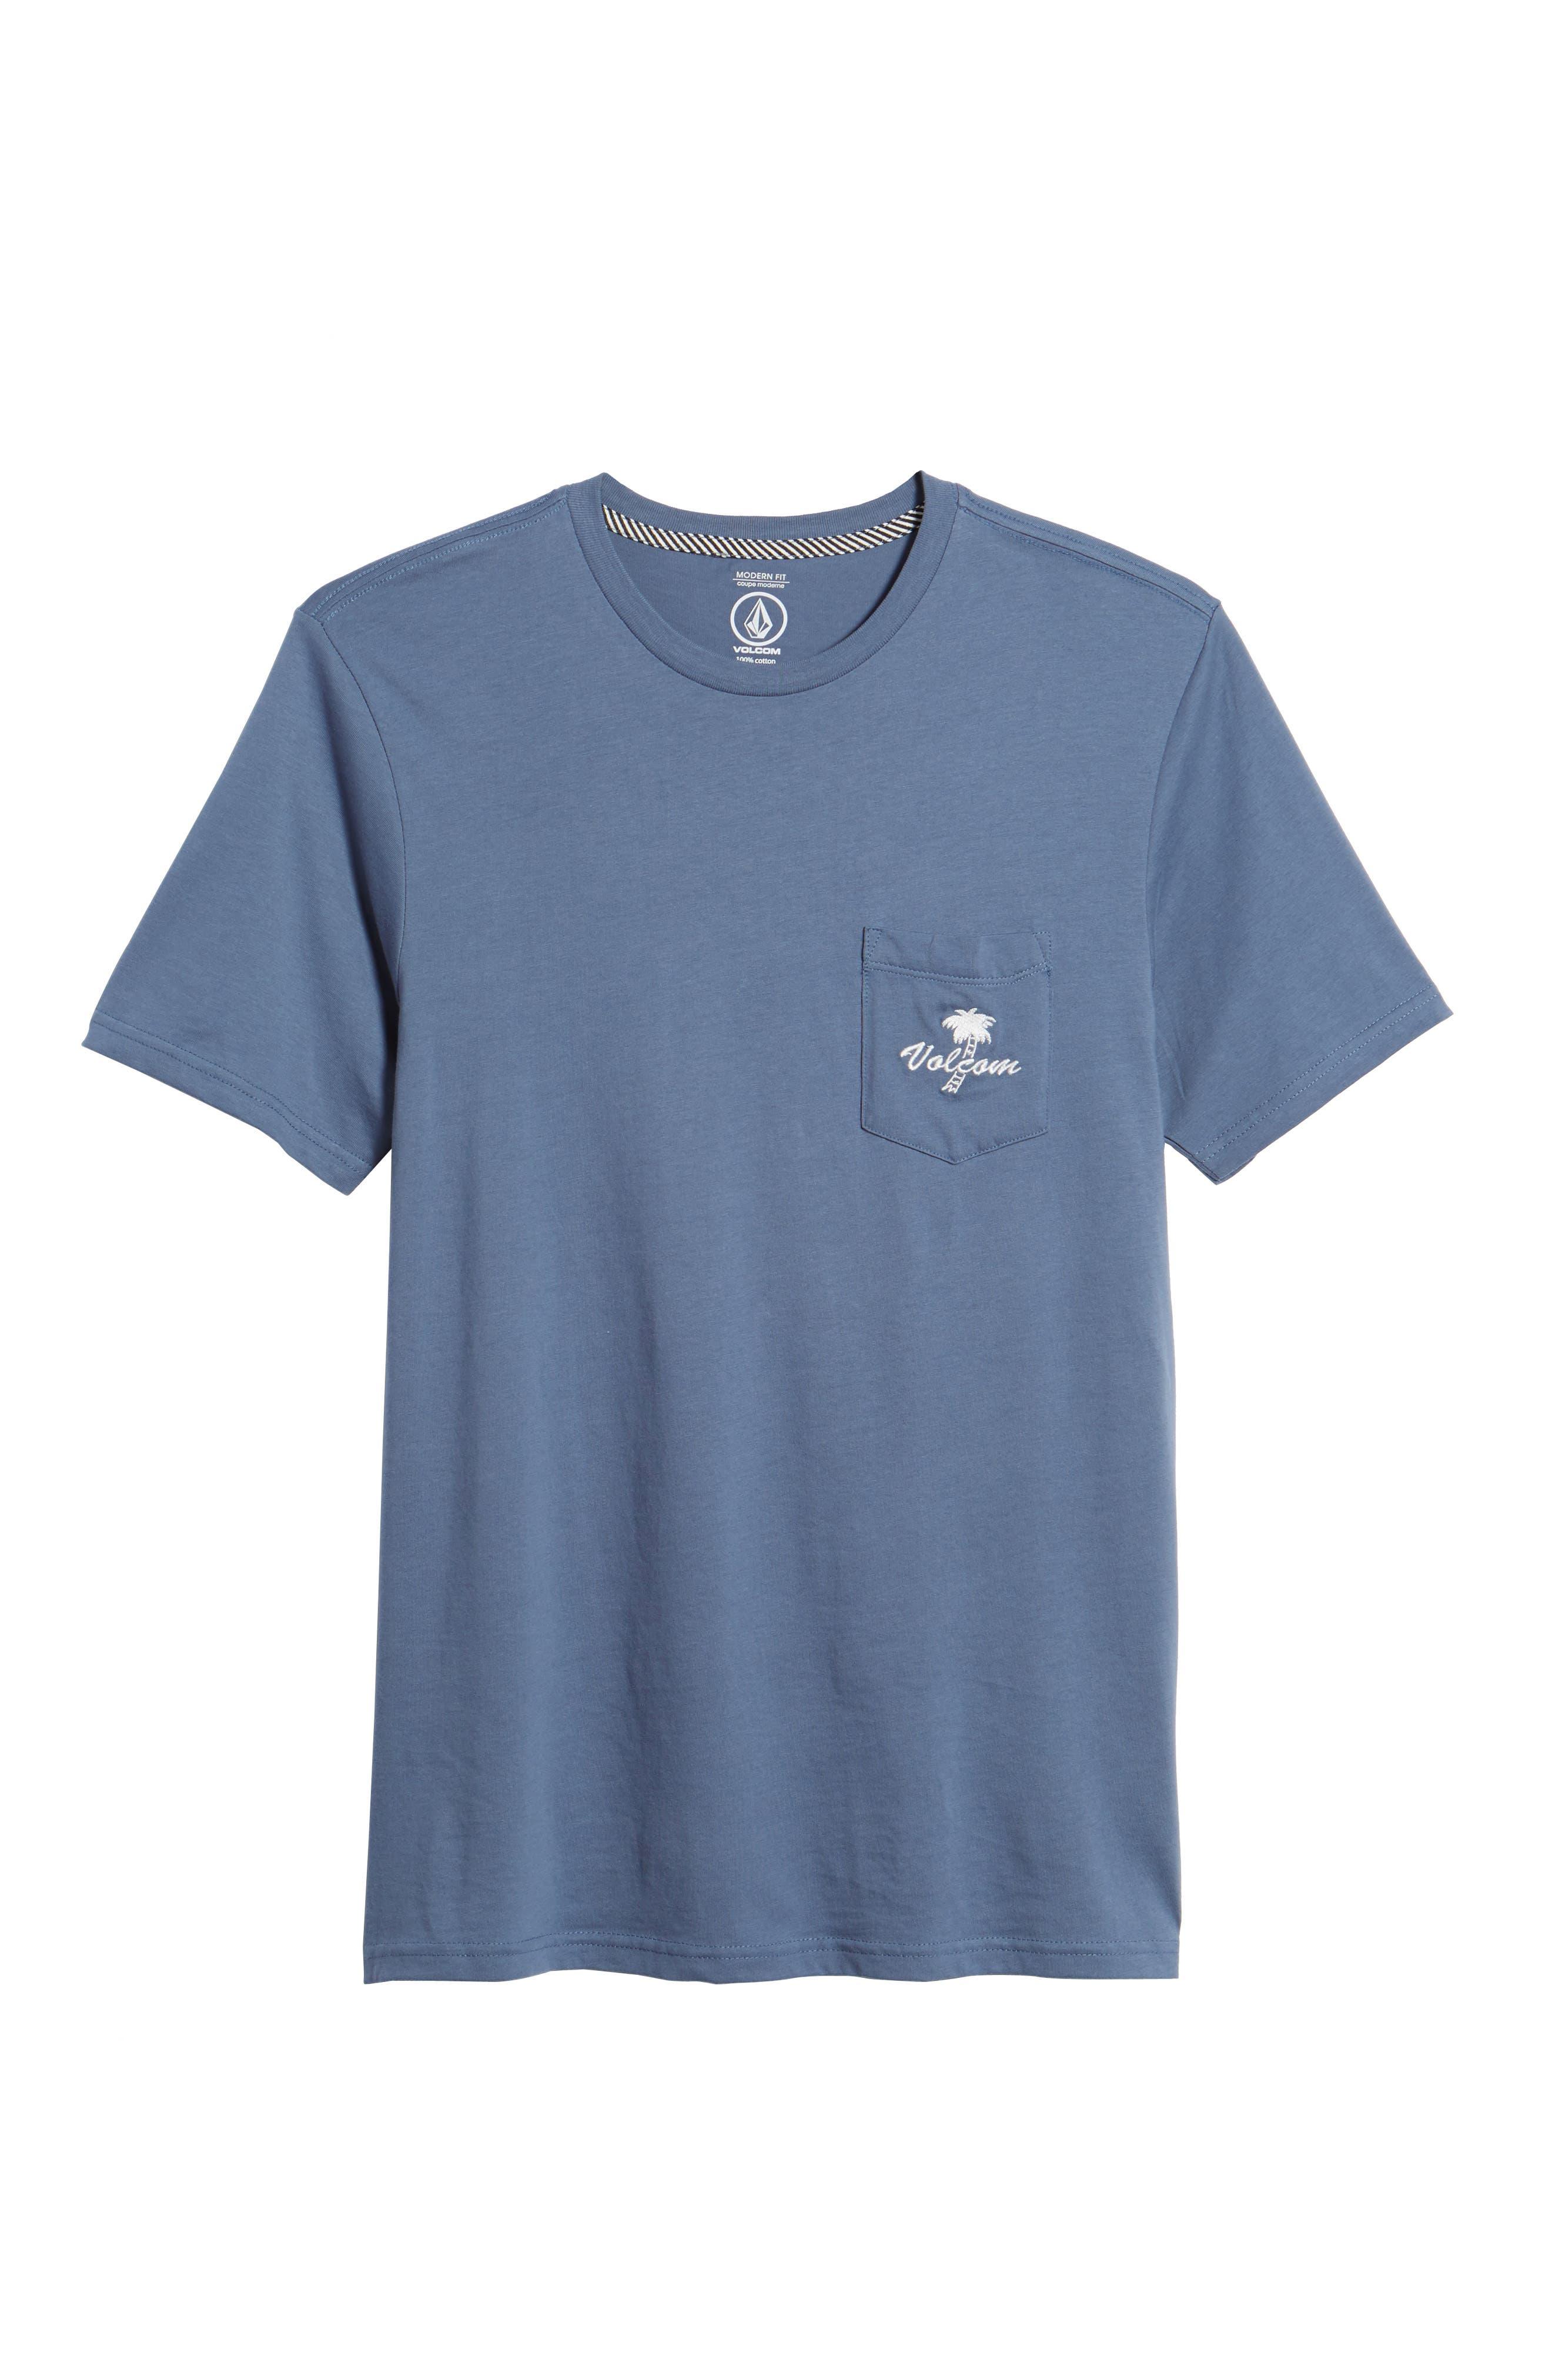 Last Resort Pocket T-Shirt,                             Alternate thumbnail 6, color,                             463